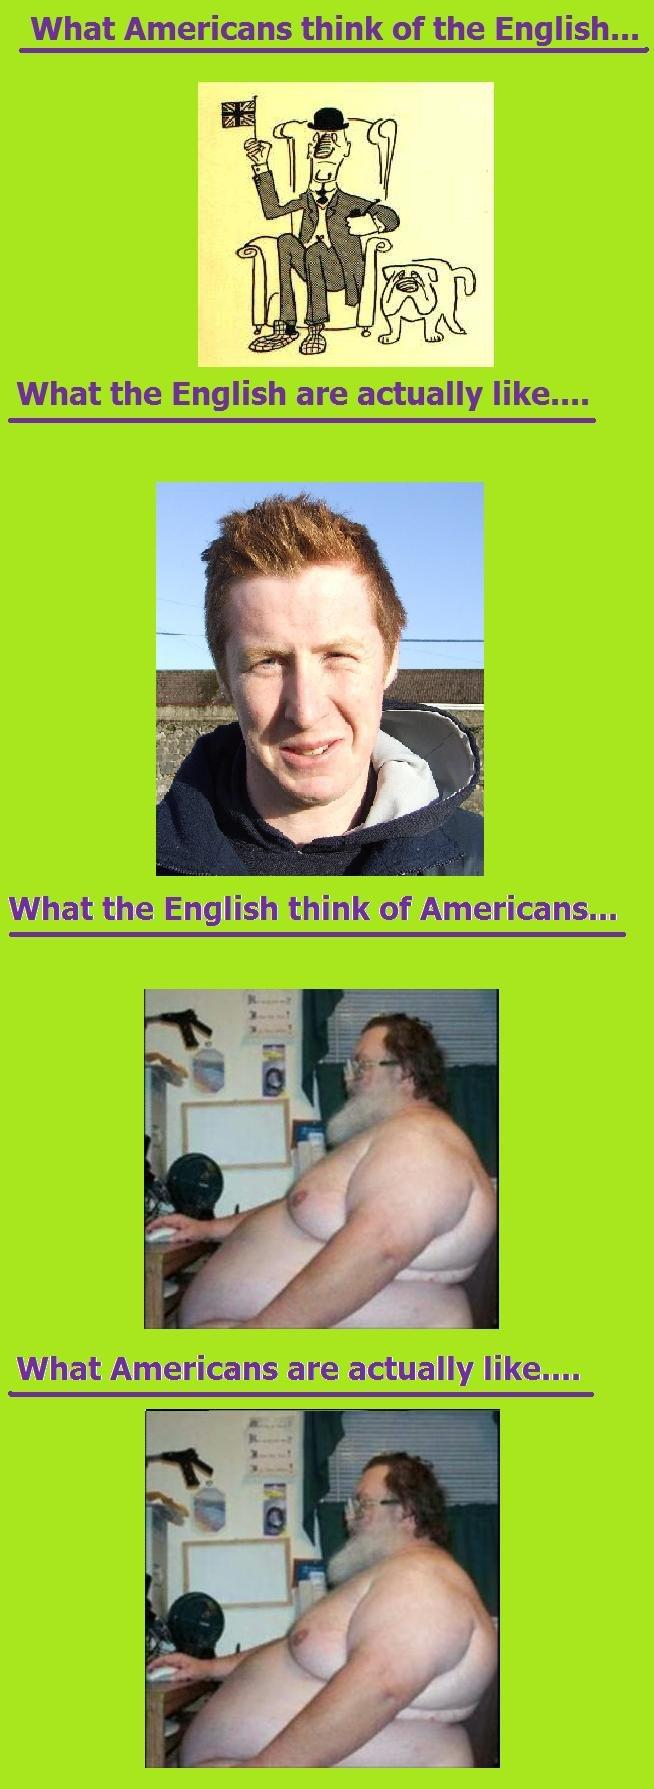 England vs. America. Its a joke, calm down. What Americans think of the English.... I SEE A NIPPLE! america english